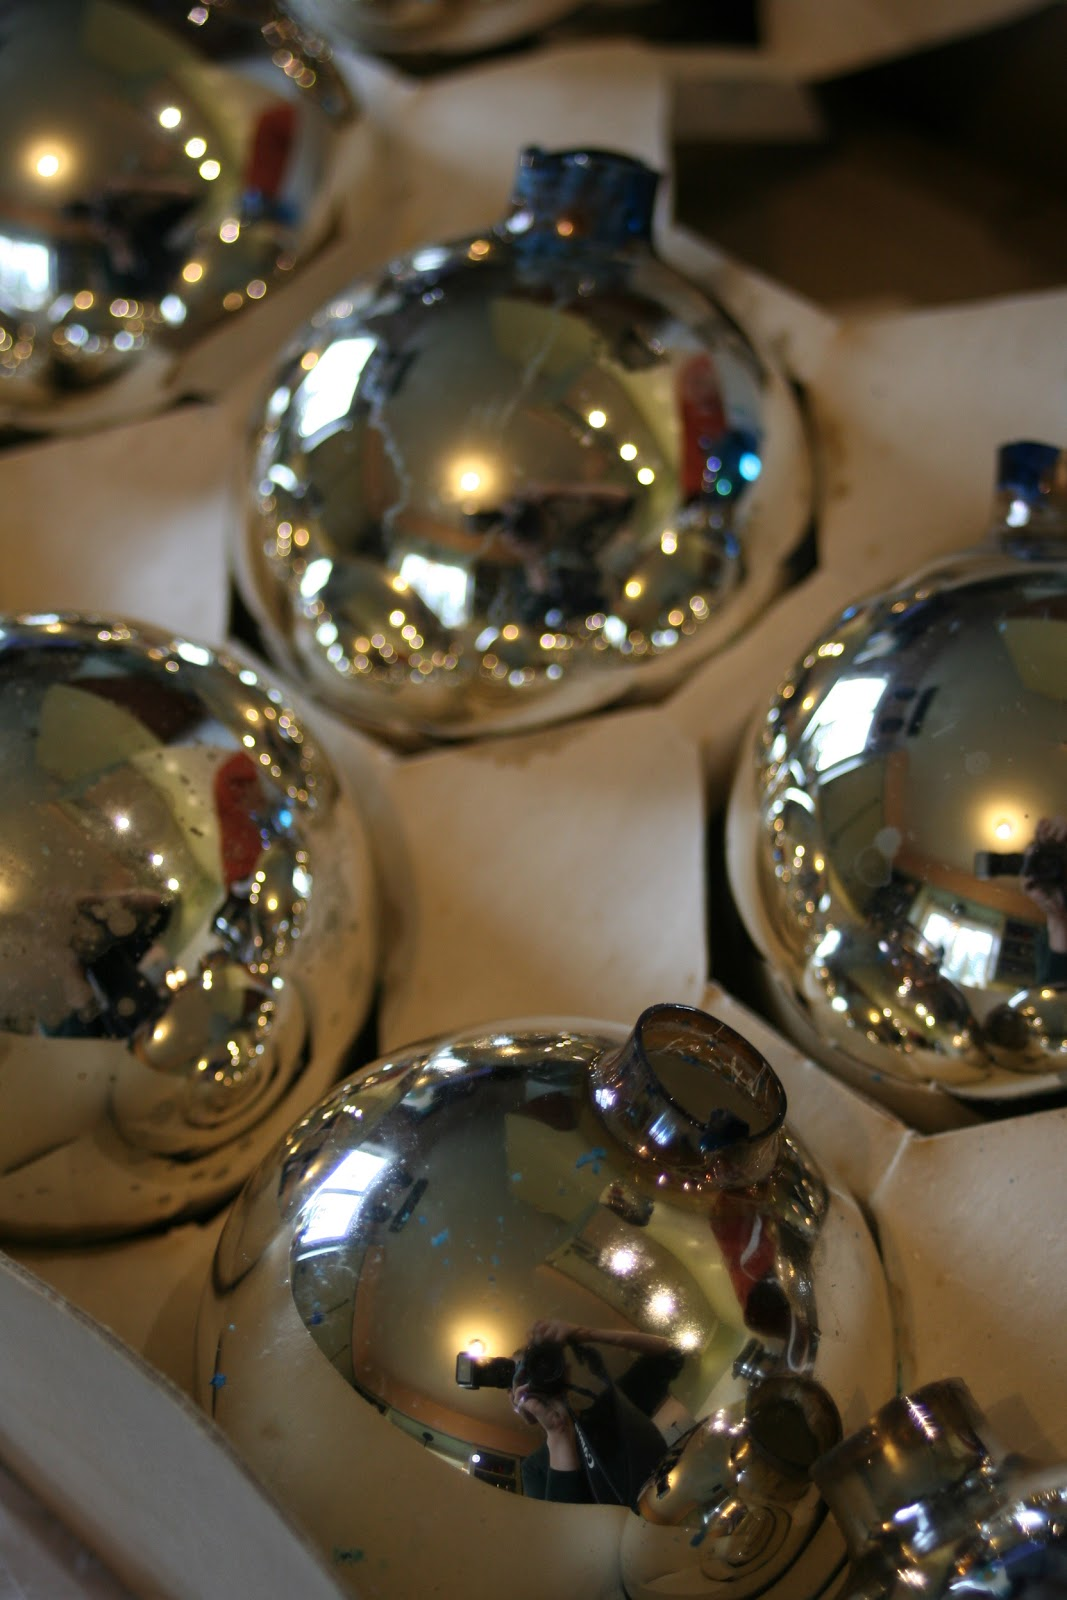 Lilliedale mercury glass ornaments